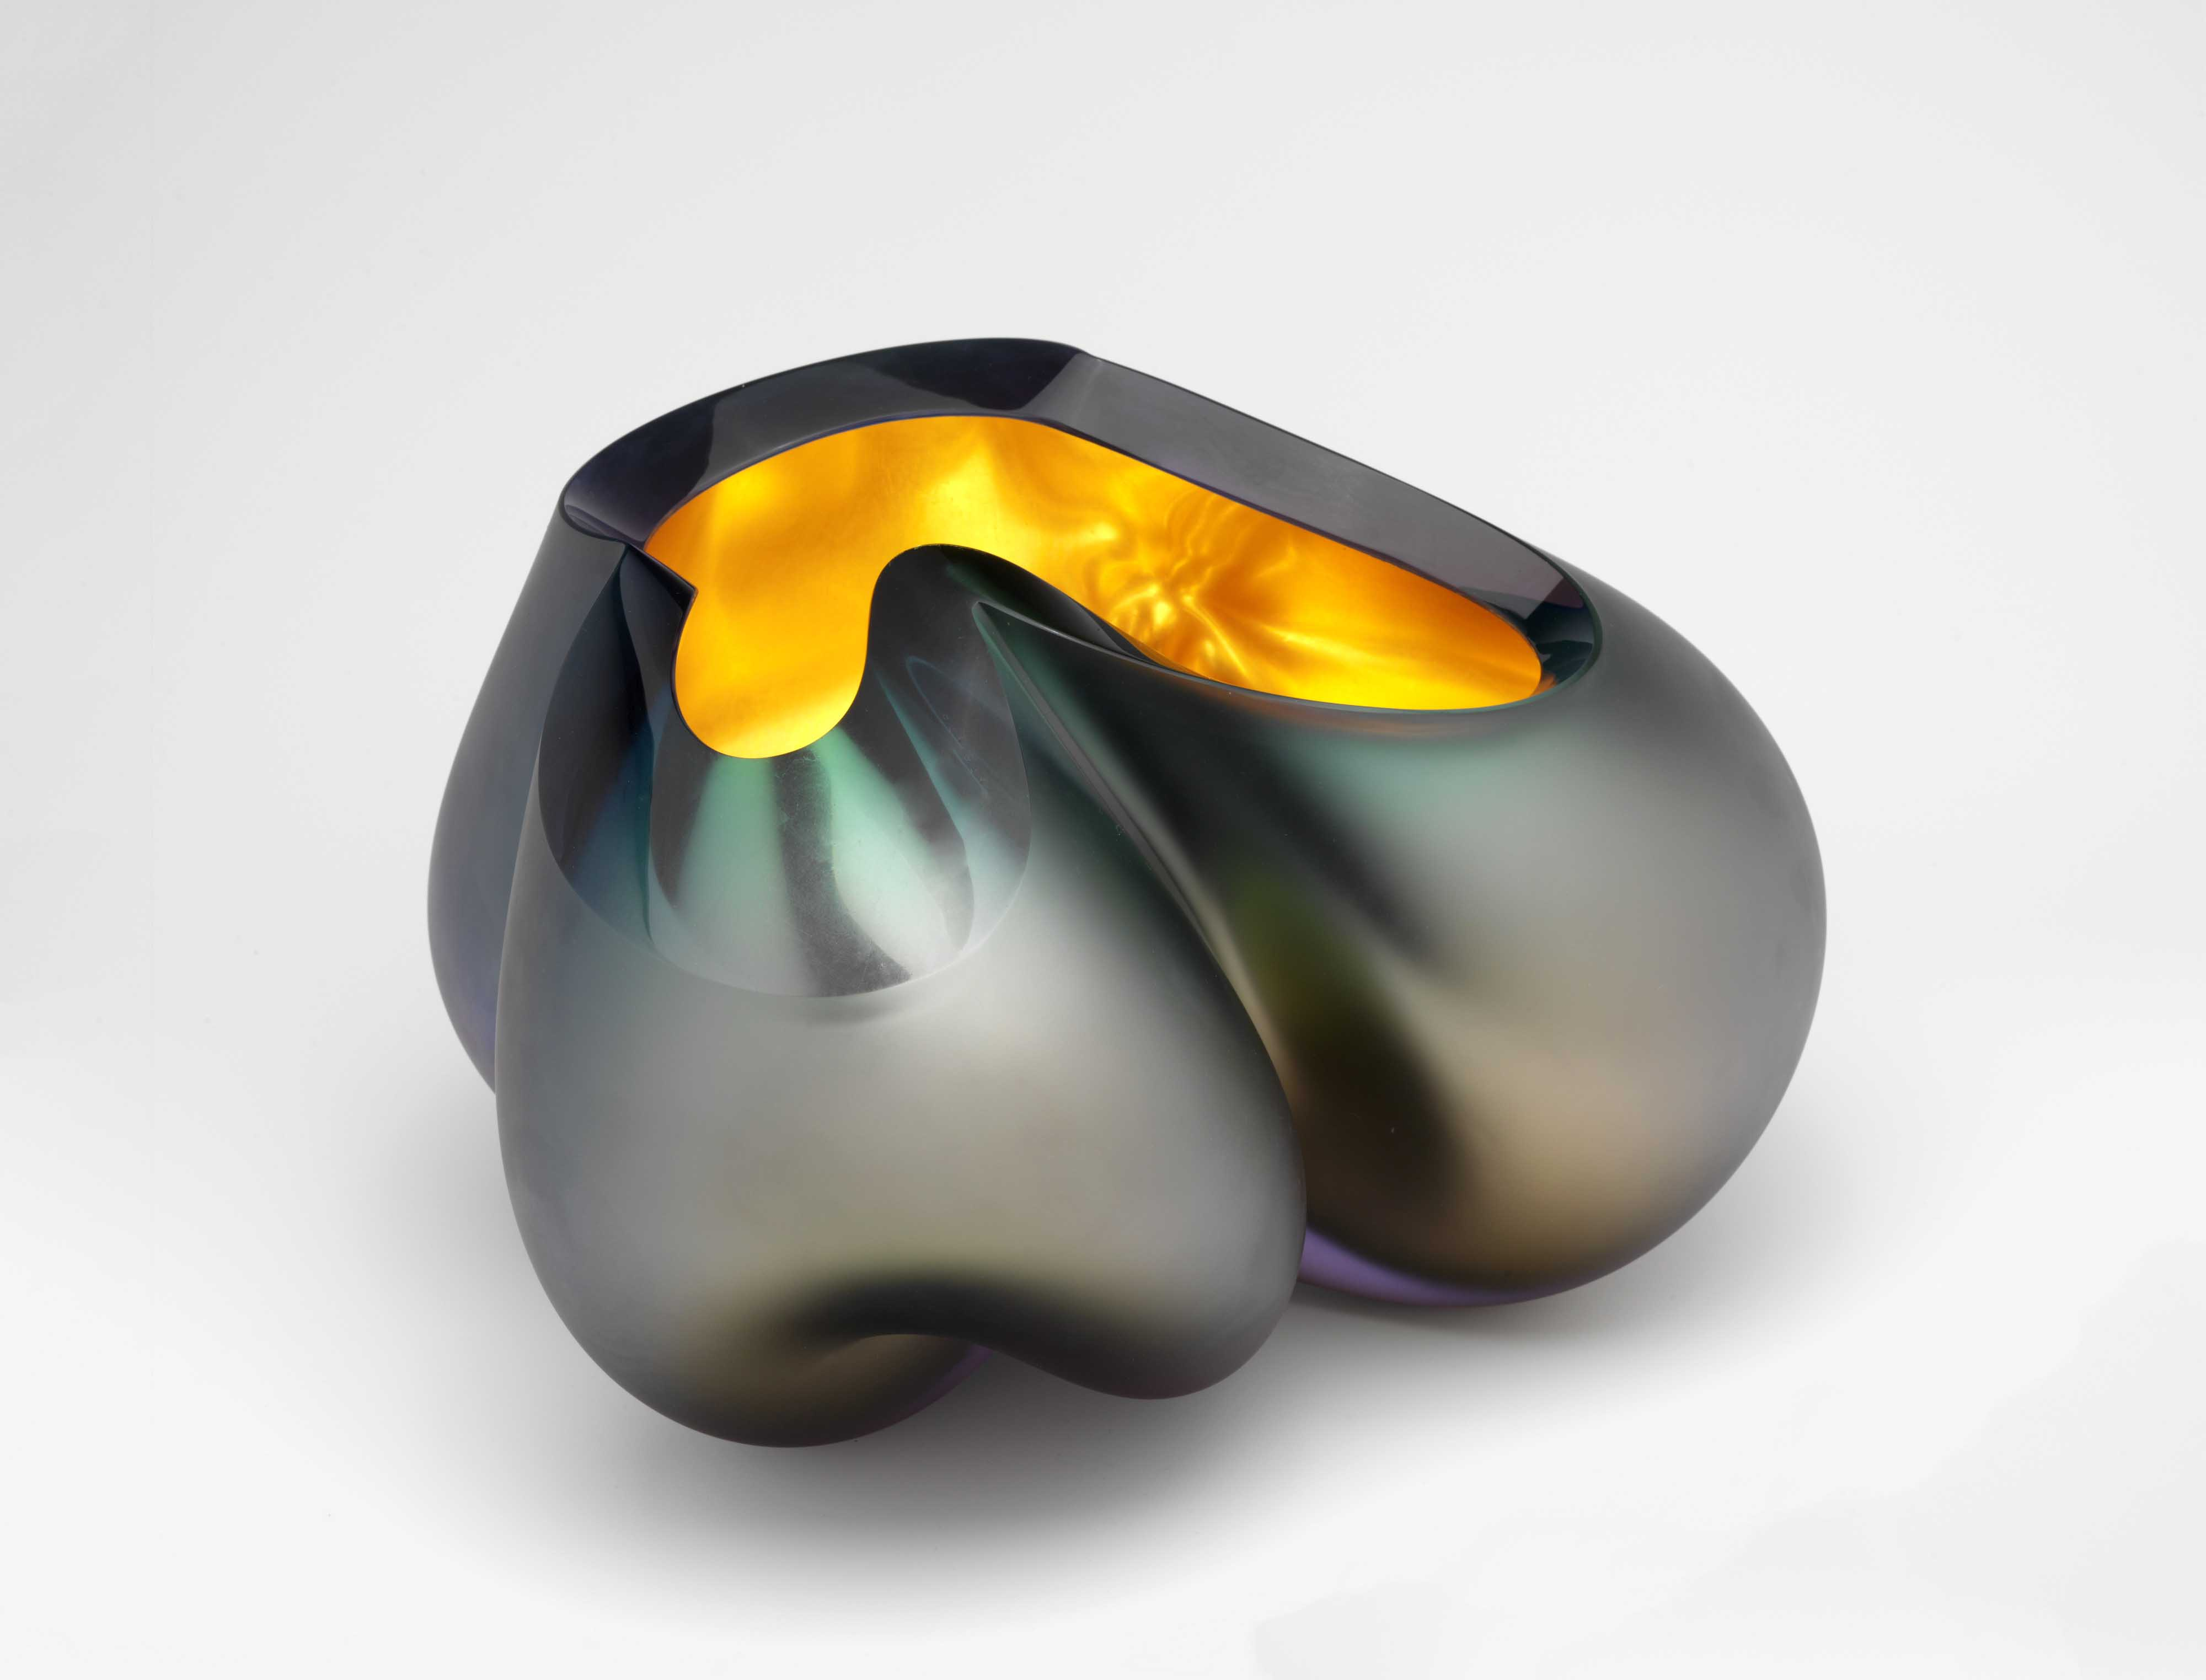 Homo Faber 2018 Venice Barbara Nanning Best of Europe Craftsmanship homo faber 2018 The Art of Glass at Homo Faber 2018 in Venice nr